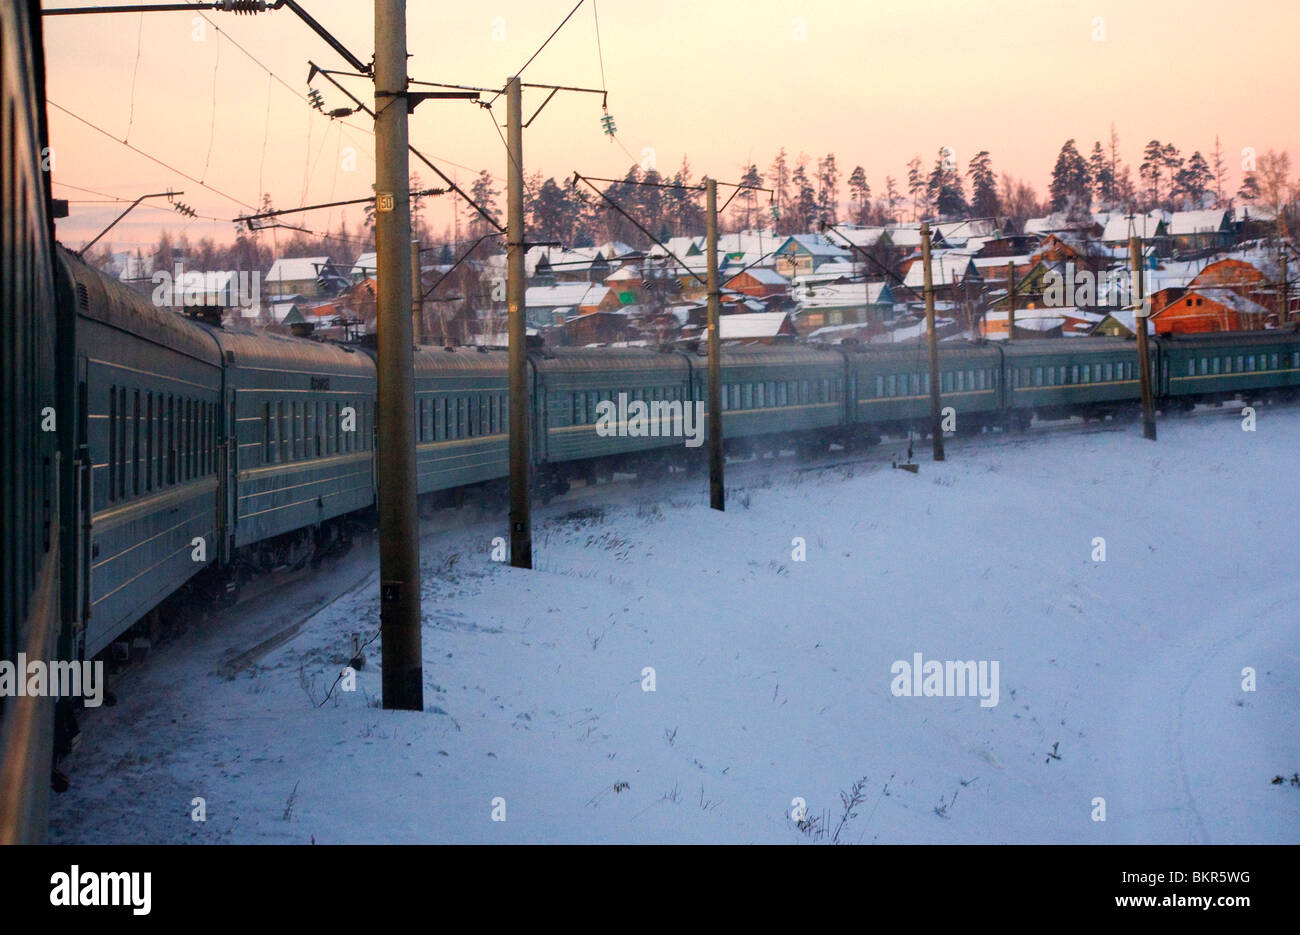 Russia, Siberia, Trans-Siberian; The train swiftly moving on the Trans-Siberian trail amidst the Siberian snow and - Stock Image